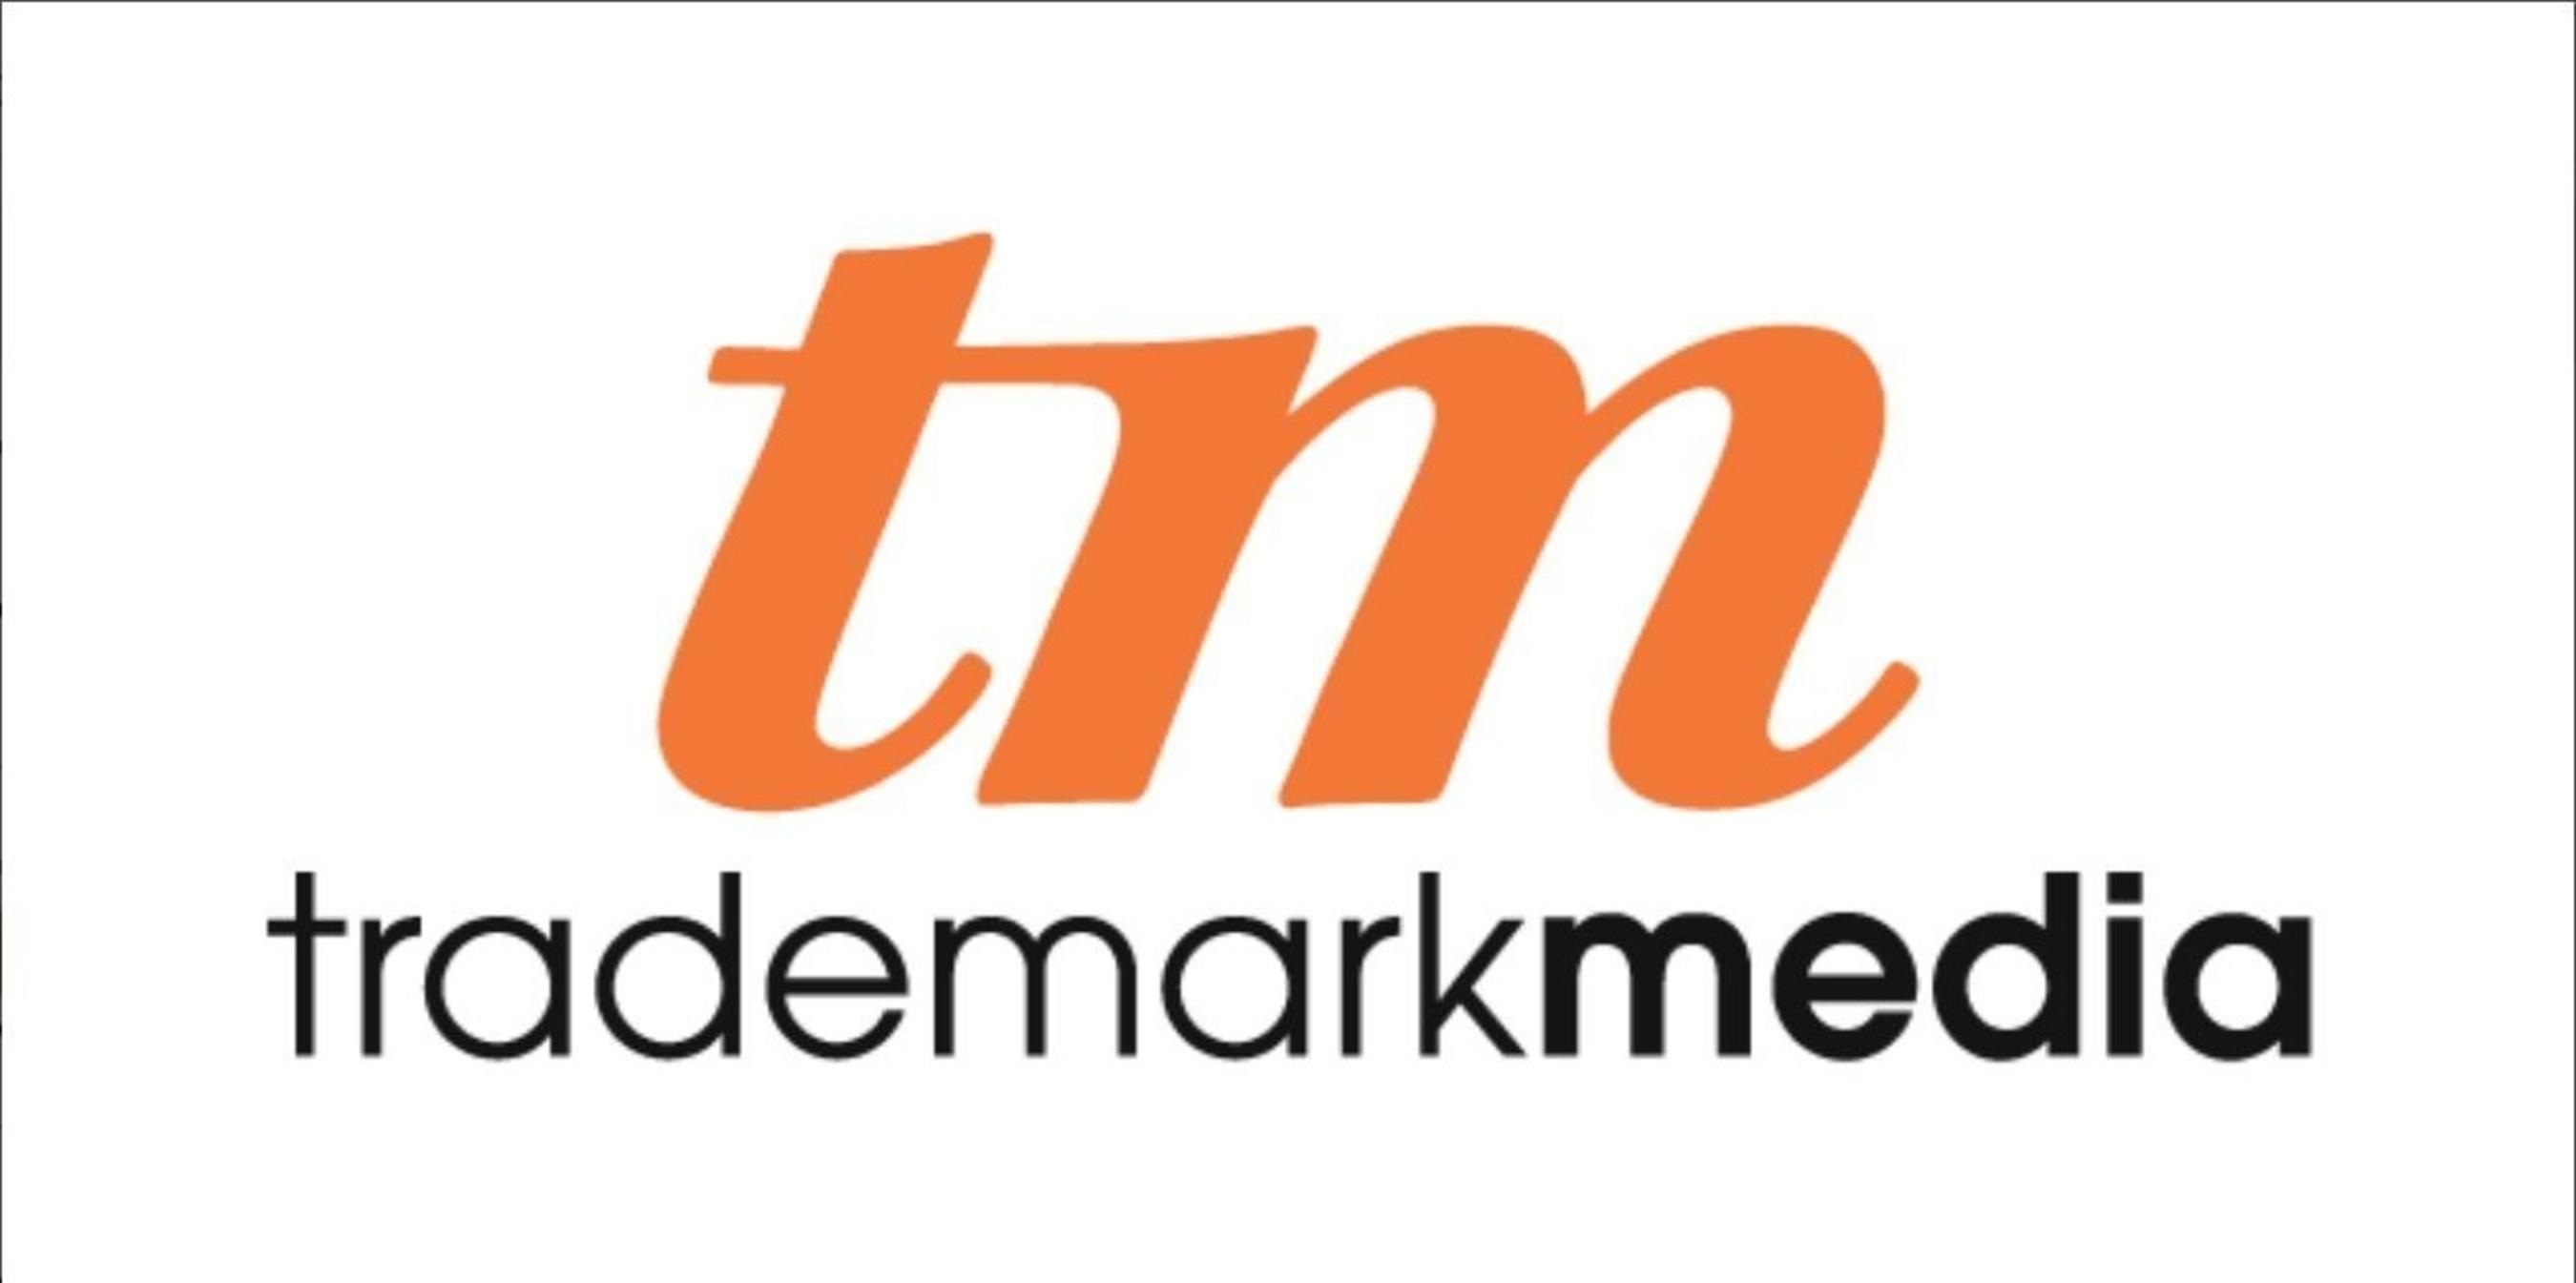 Digital Firm TradeMark Media Invests in Austin, Texas' Growing Eastside Landscape